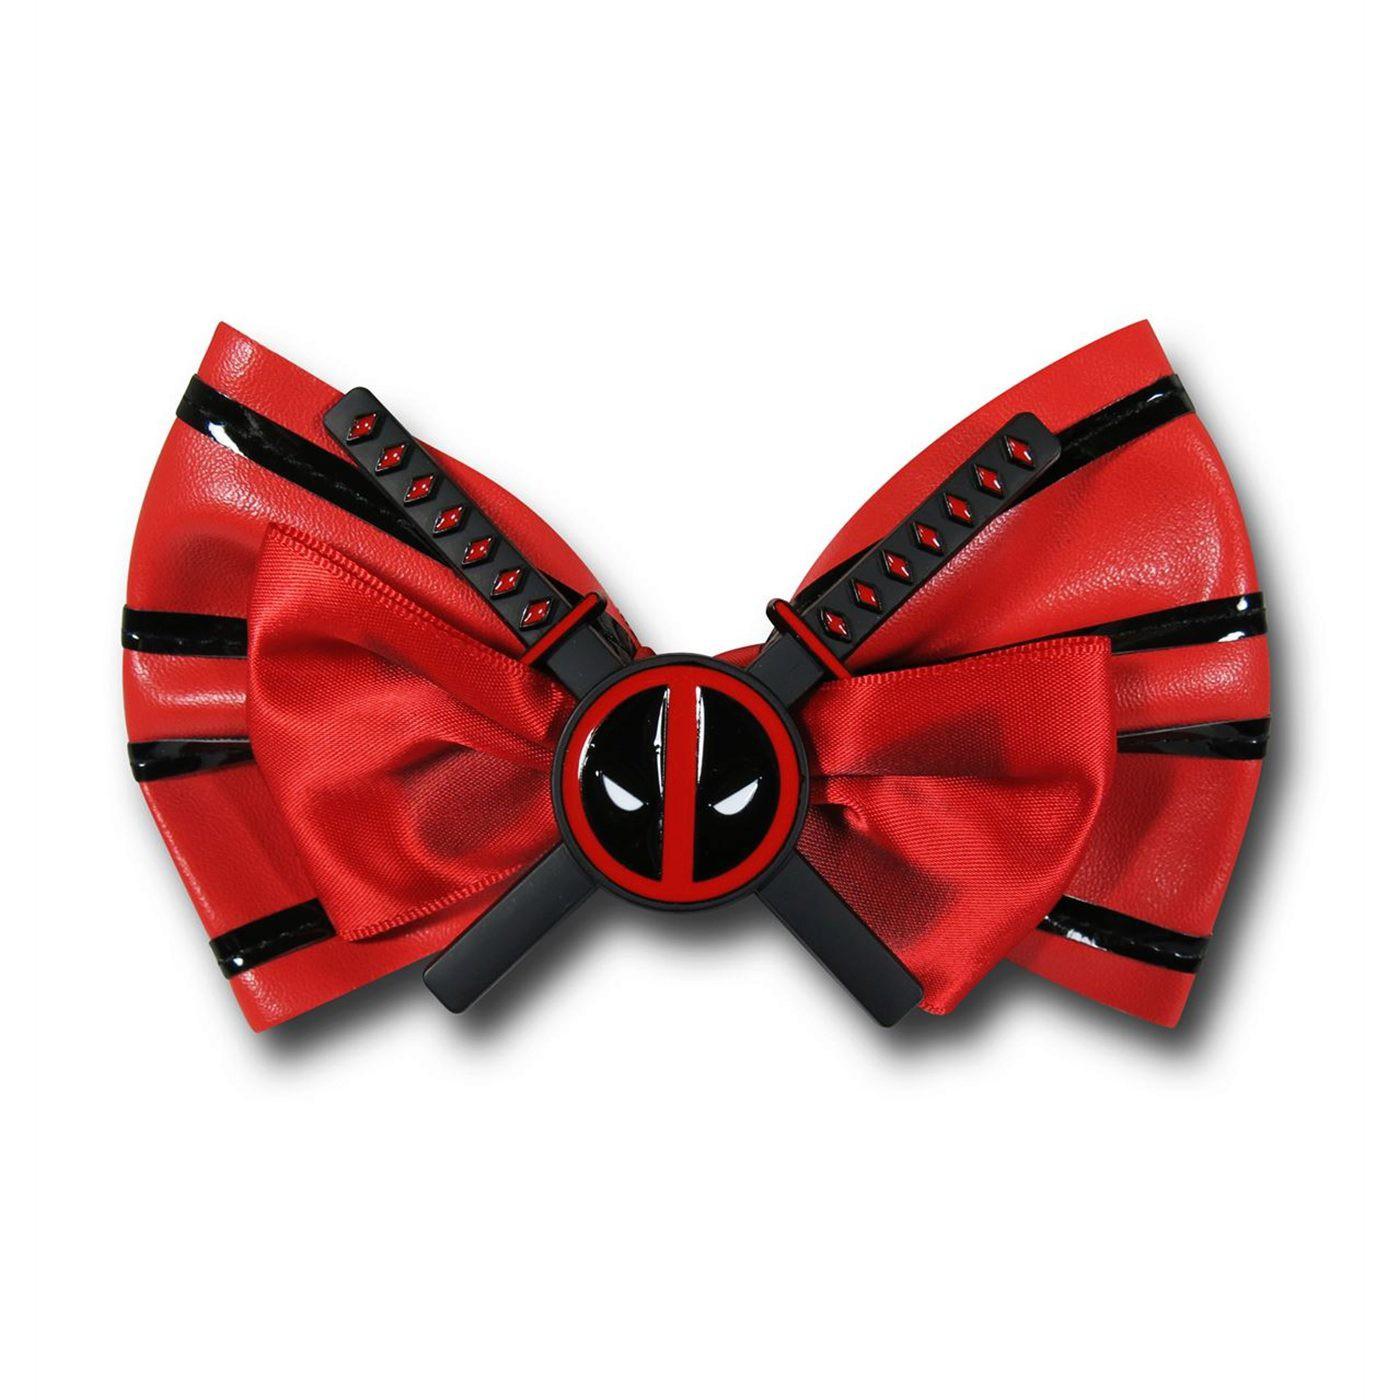 Deadpool Swords Crossed Hair Bow